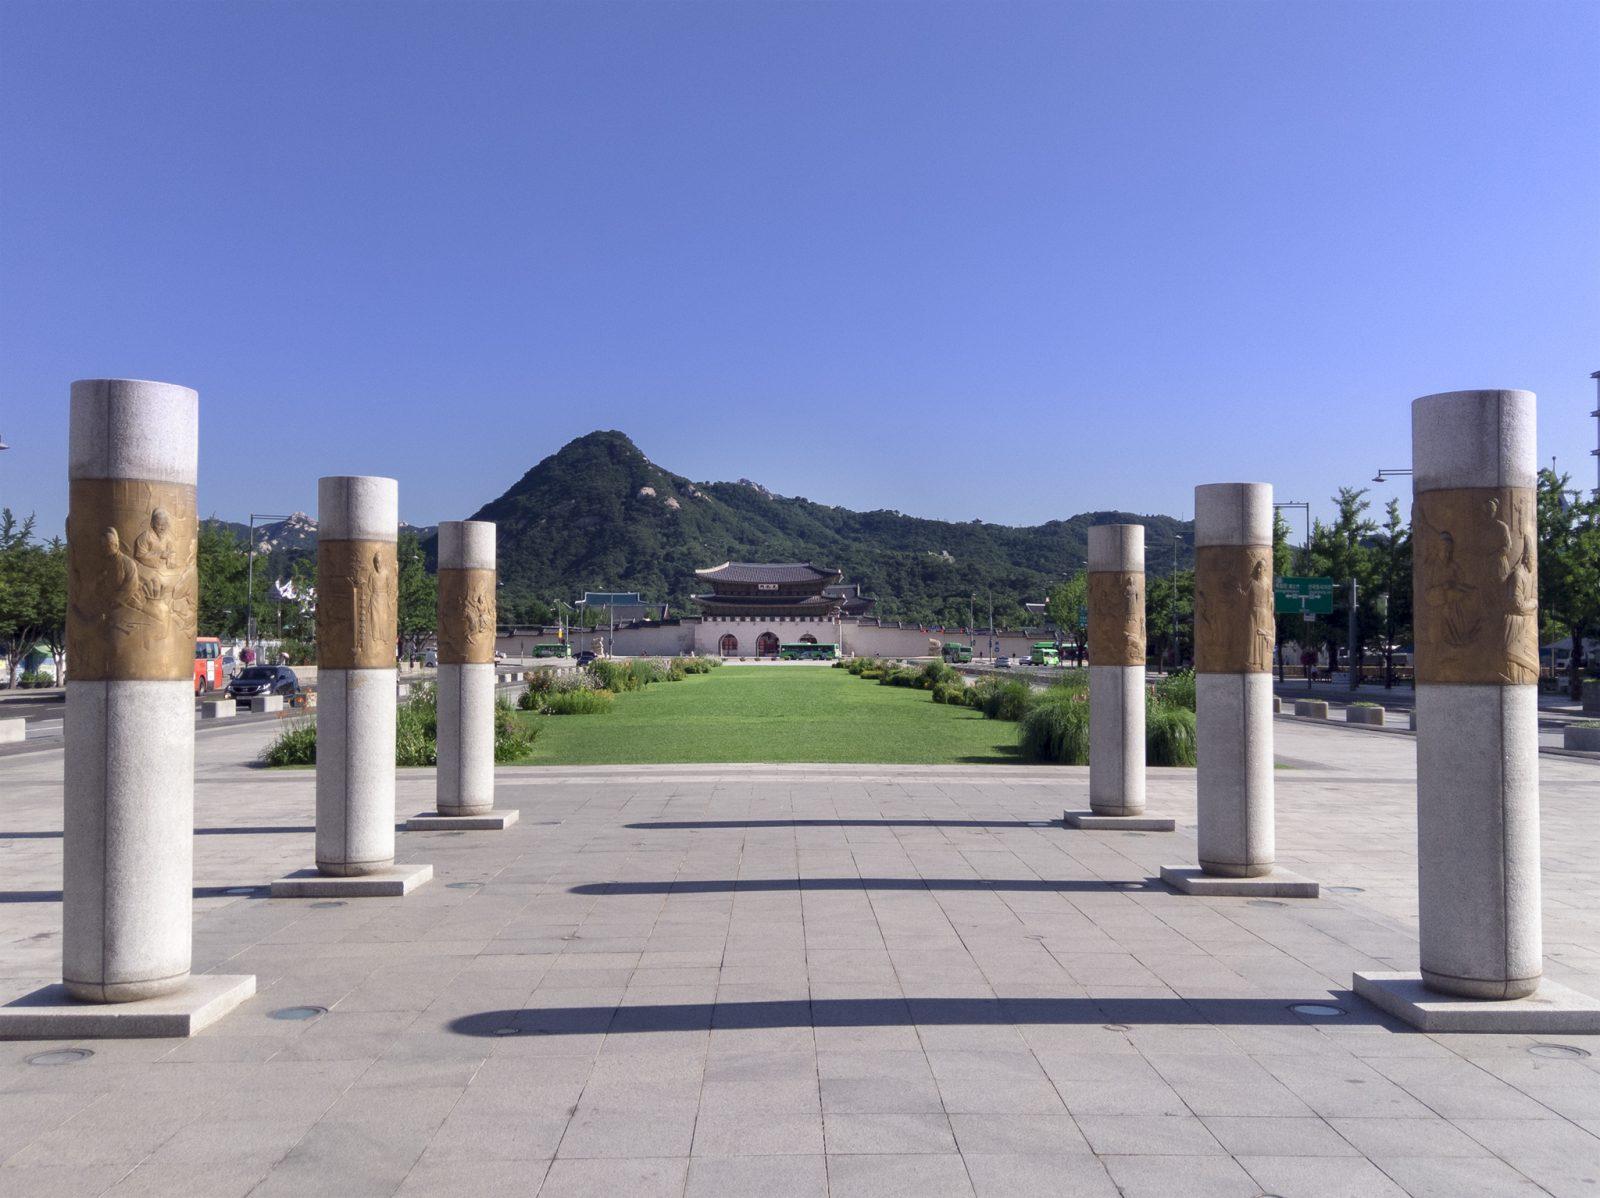 Hangeul Columns